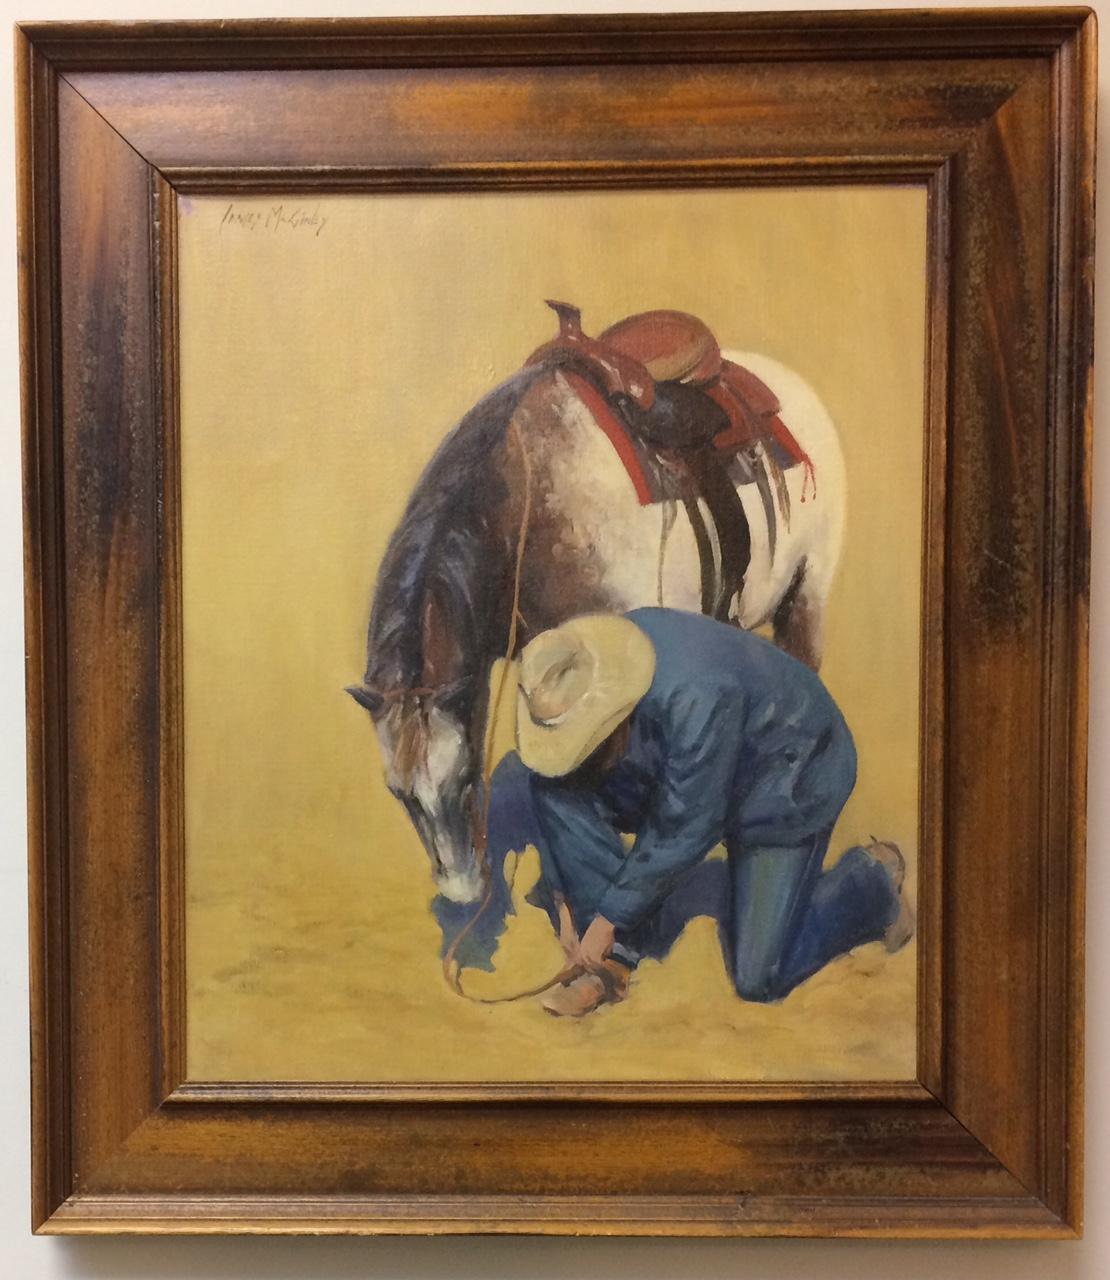 Fixing the Spur, original 24x20 southwestern figurative impressionist landscape